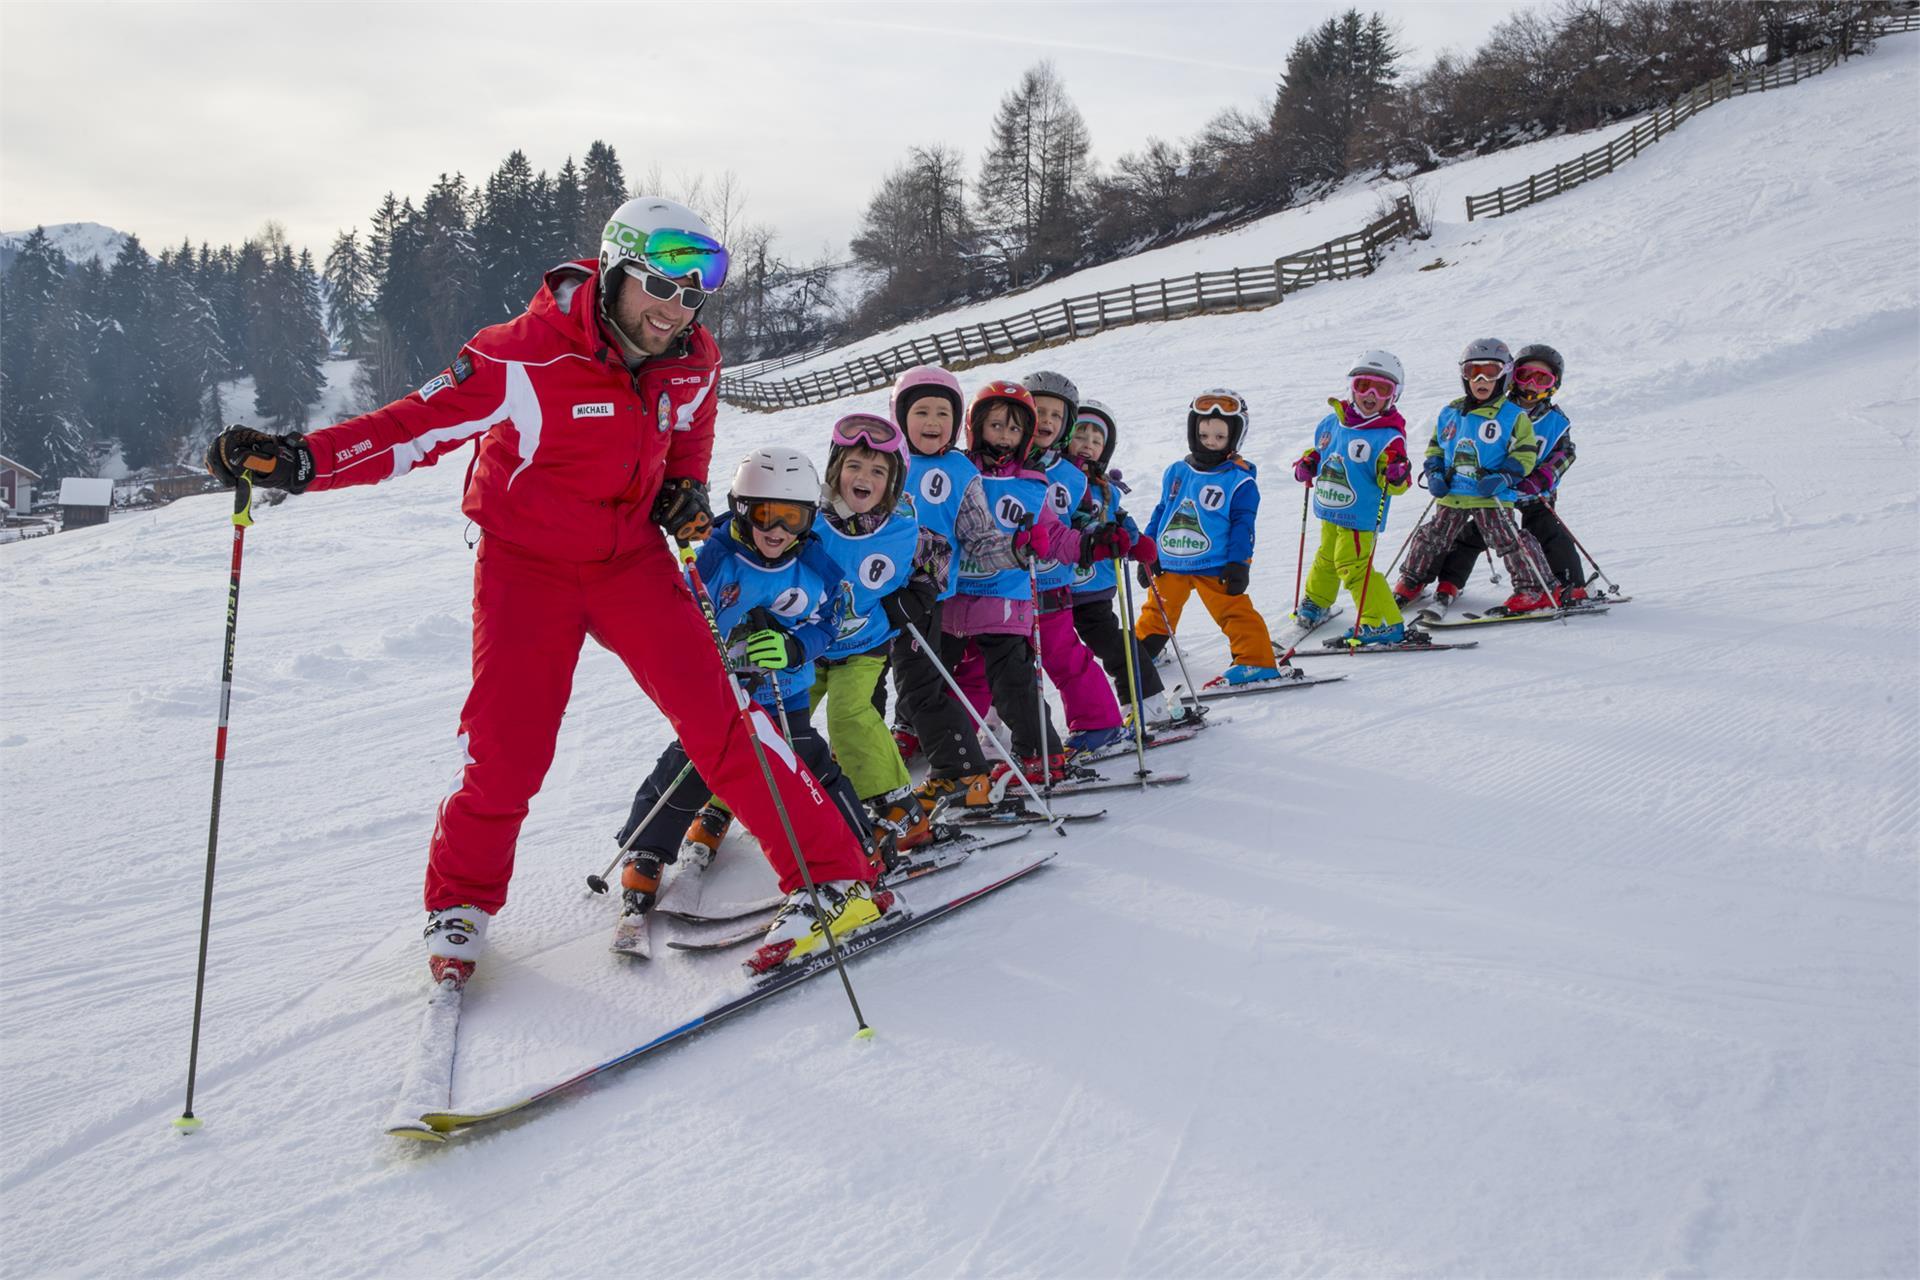 Skischule Taisten